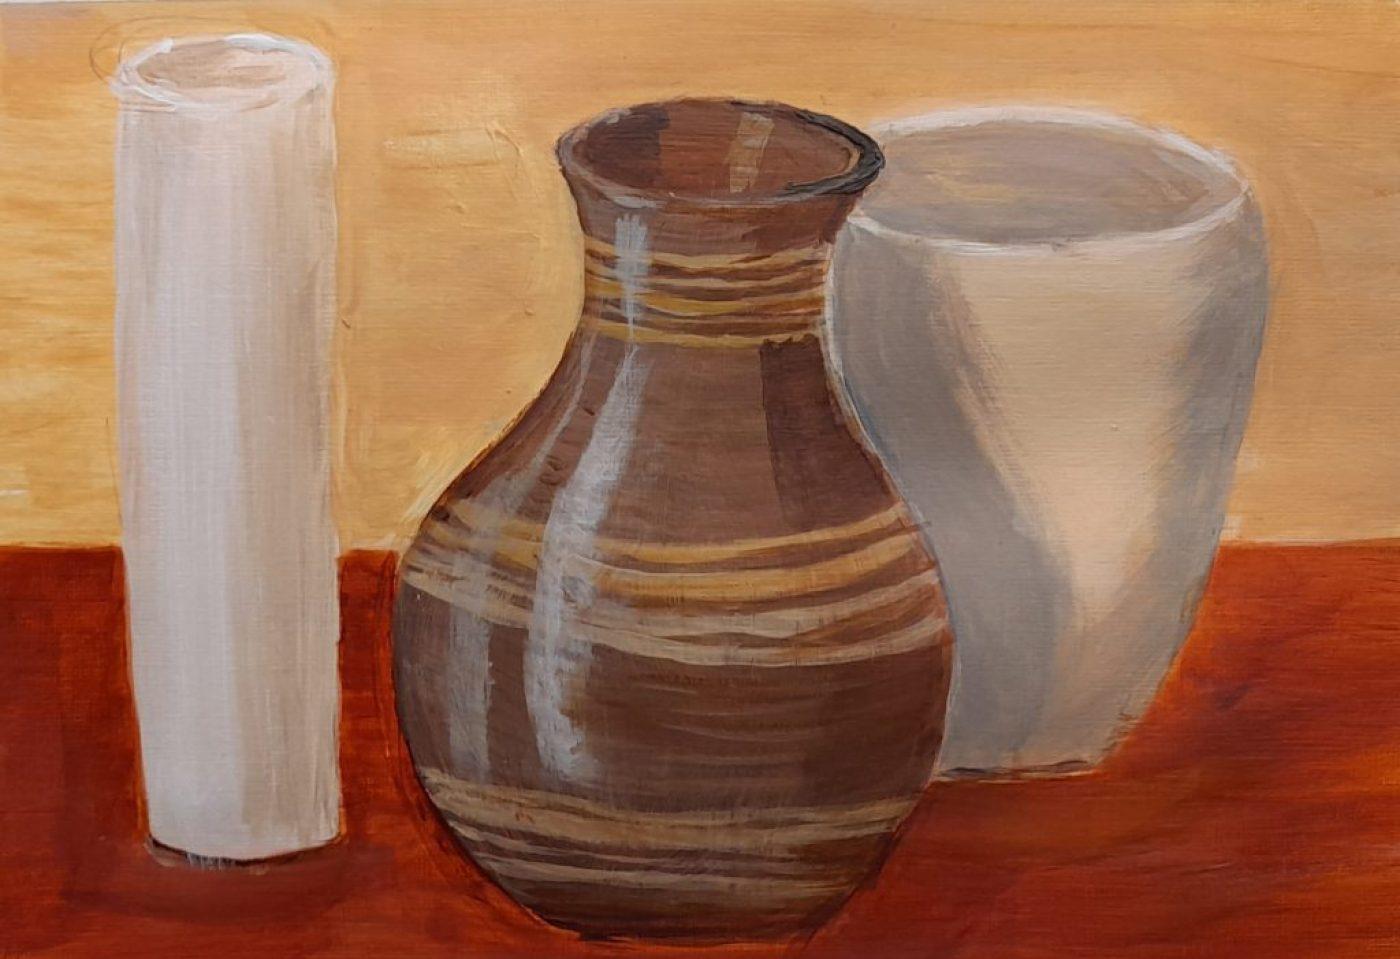 Acrylic painting, level 1 - May 2021